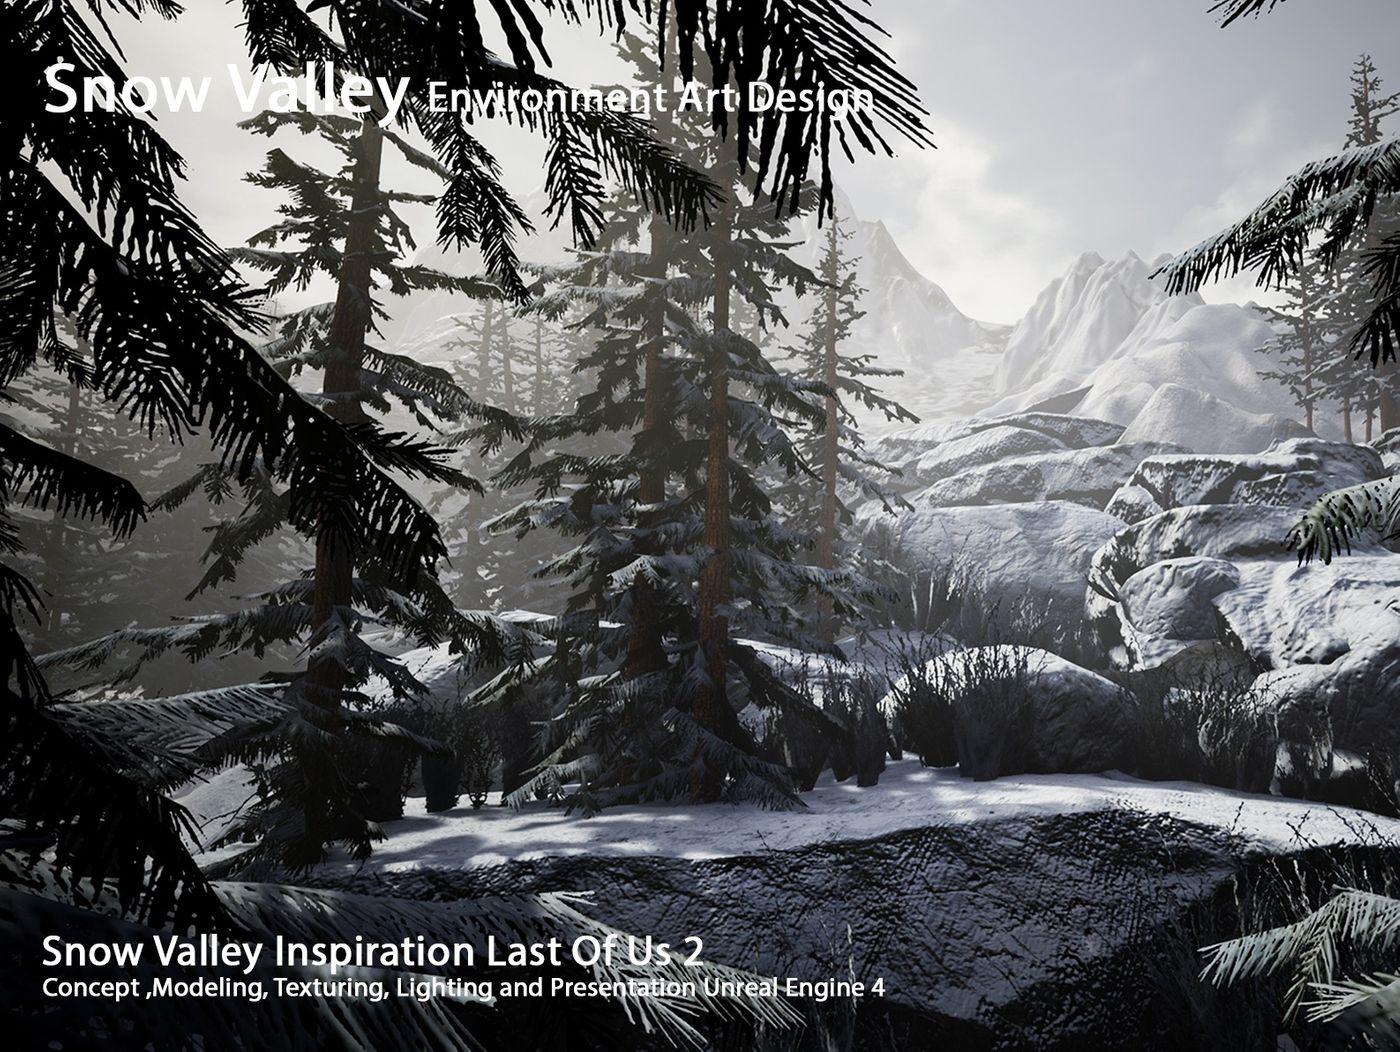 Snow Valley Environment Art Design